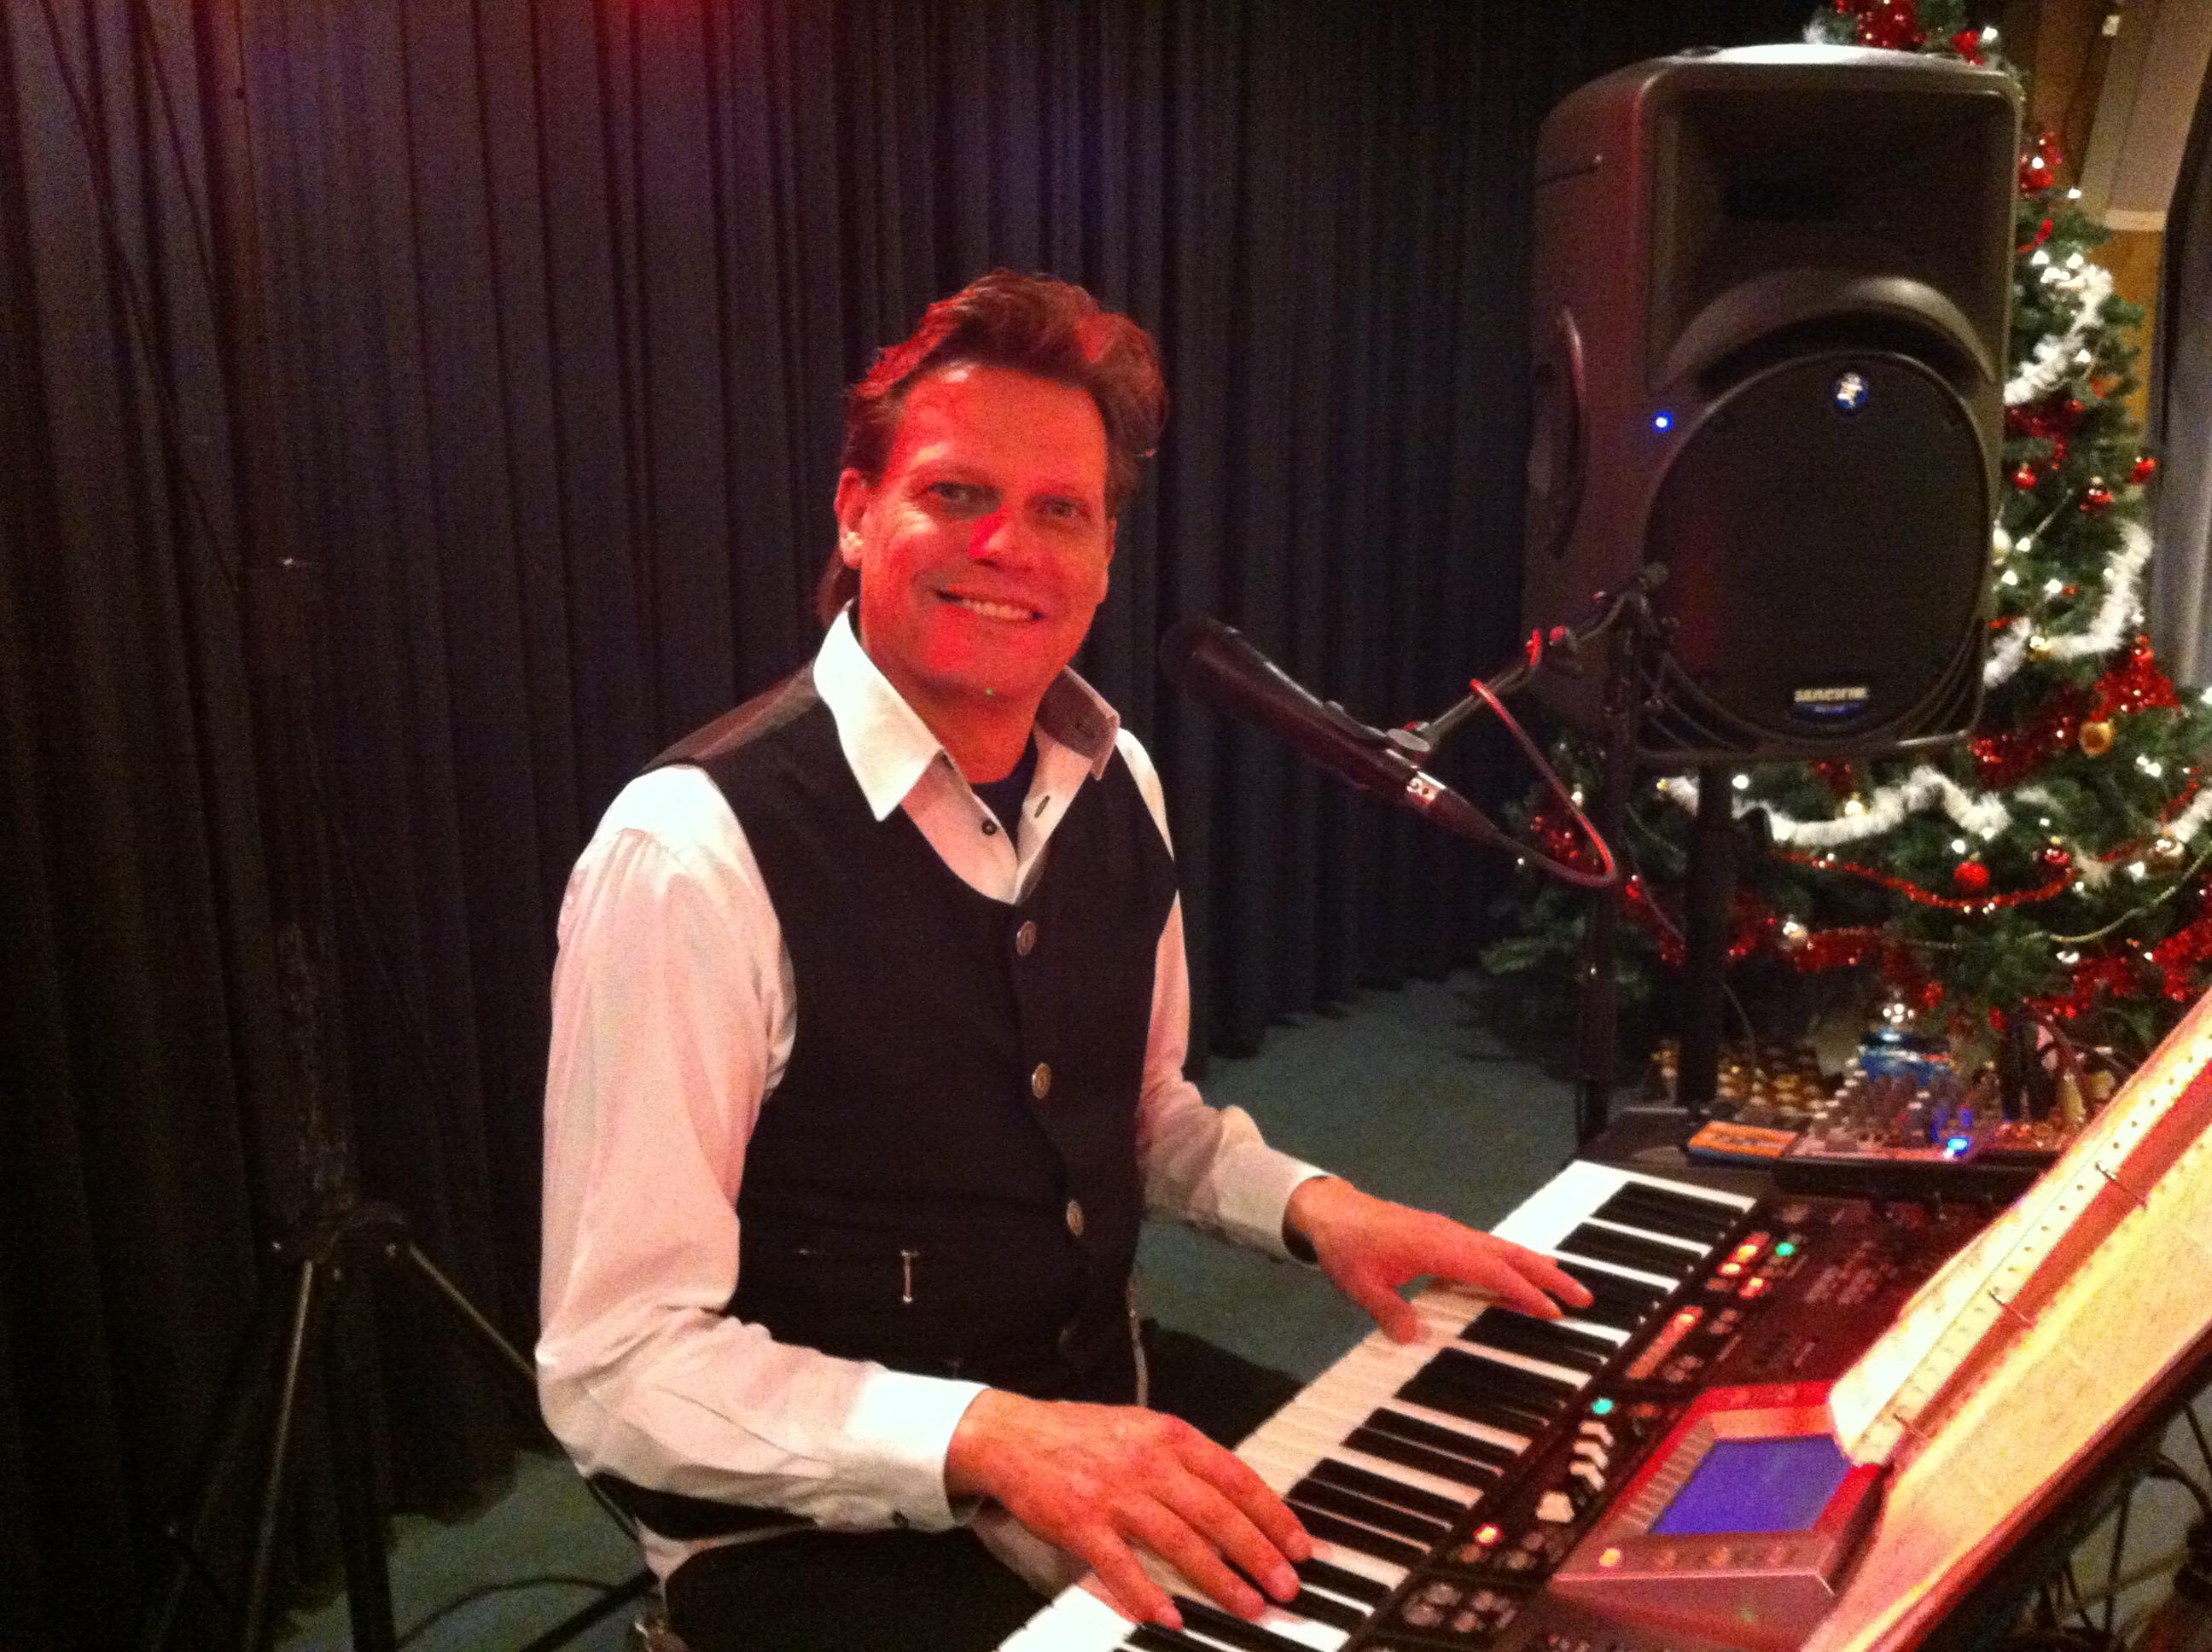 Kerst muziek live gezongen kerstrepertoire muzikant pianist zanger